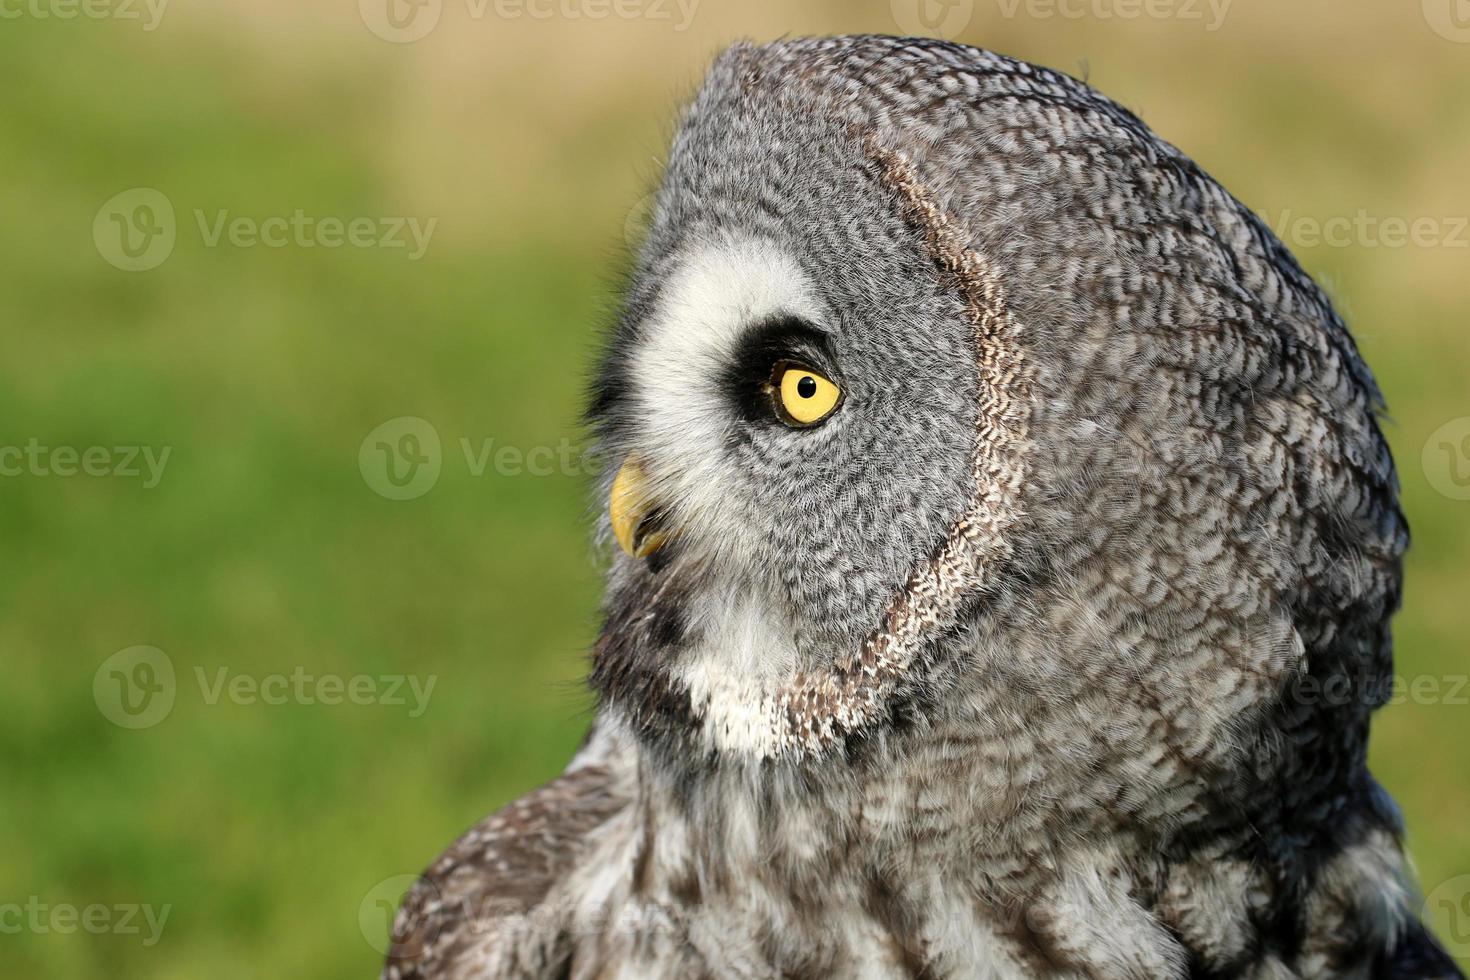 Great gray owl portrait photo